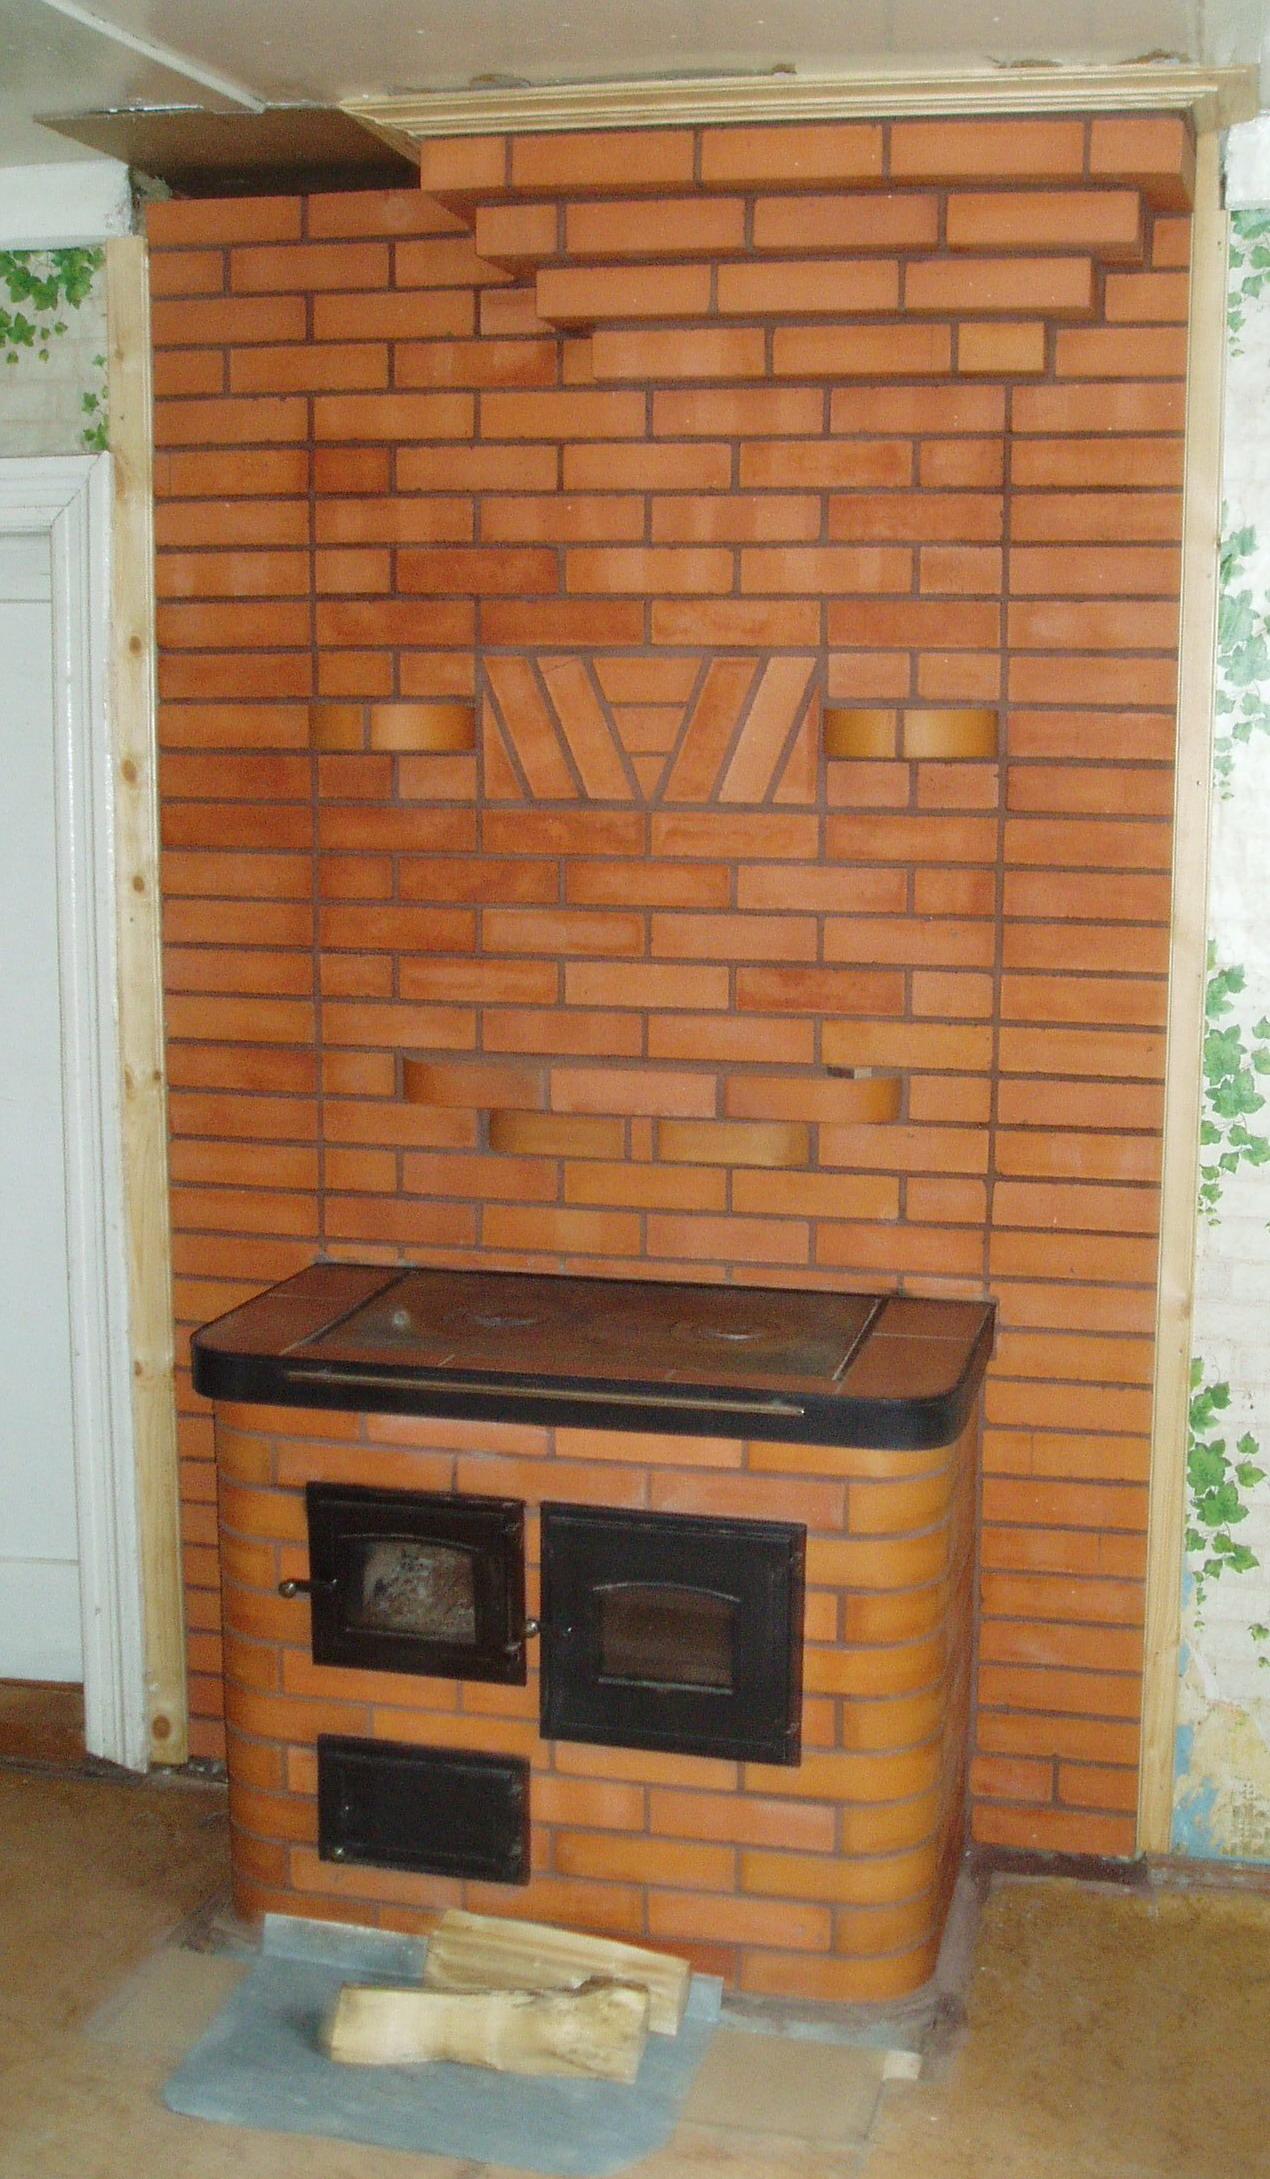 Кухонная плита с духовкой из кирпича своими руками